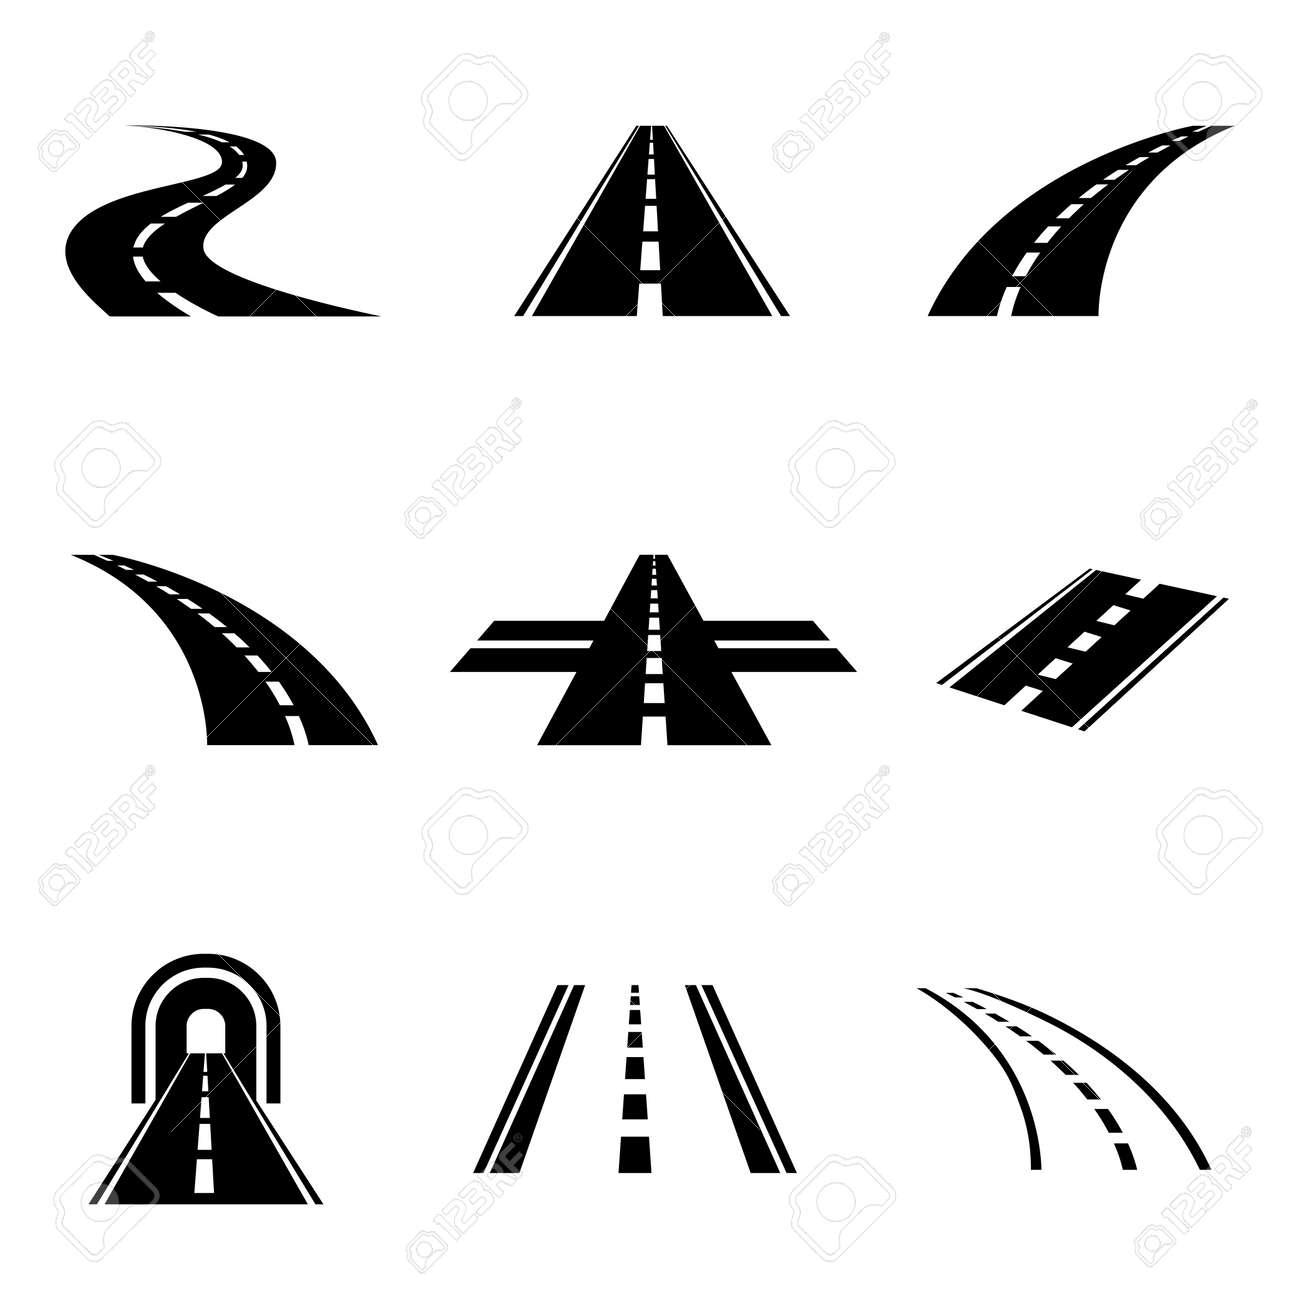 Vector black car road icons set. Highway symbols. Road signs - 55658347